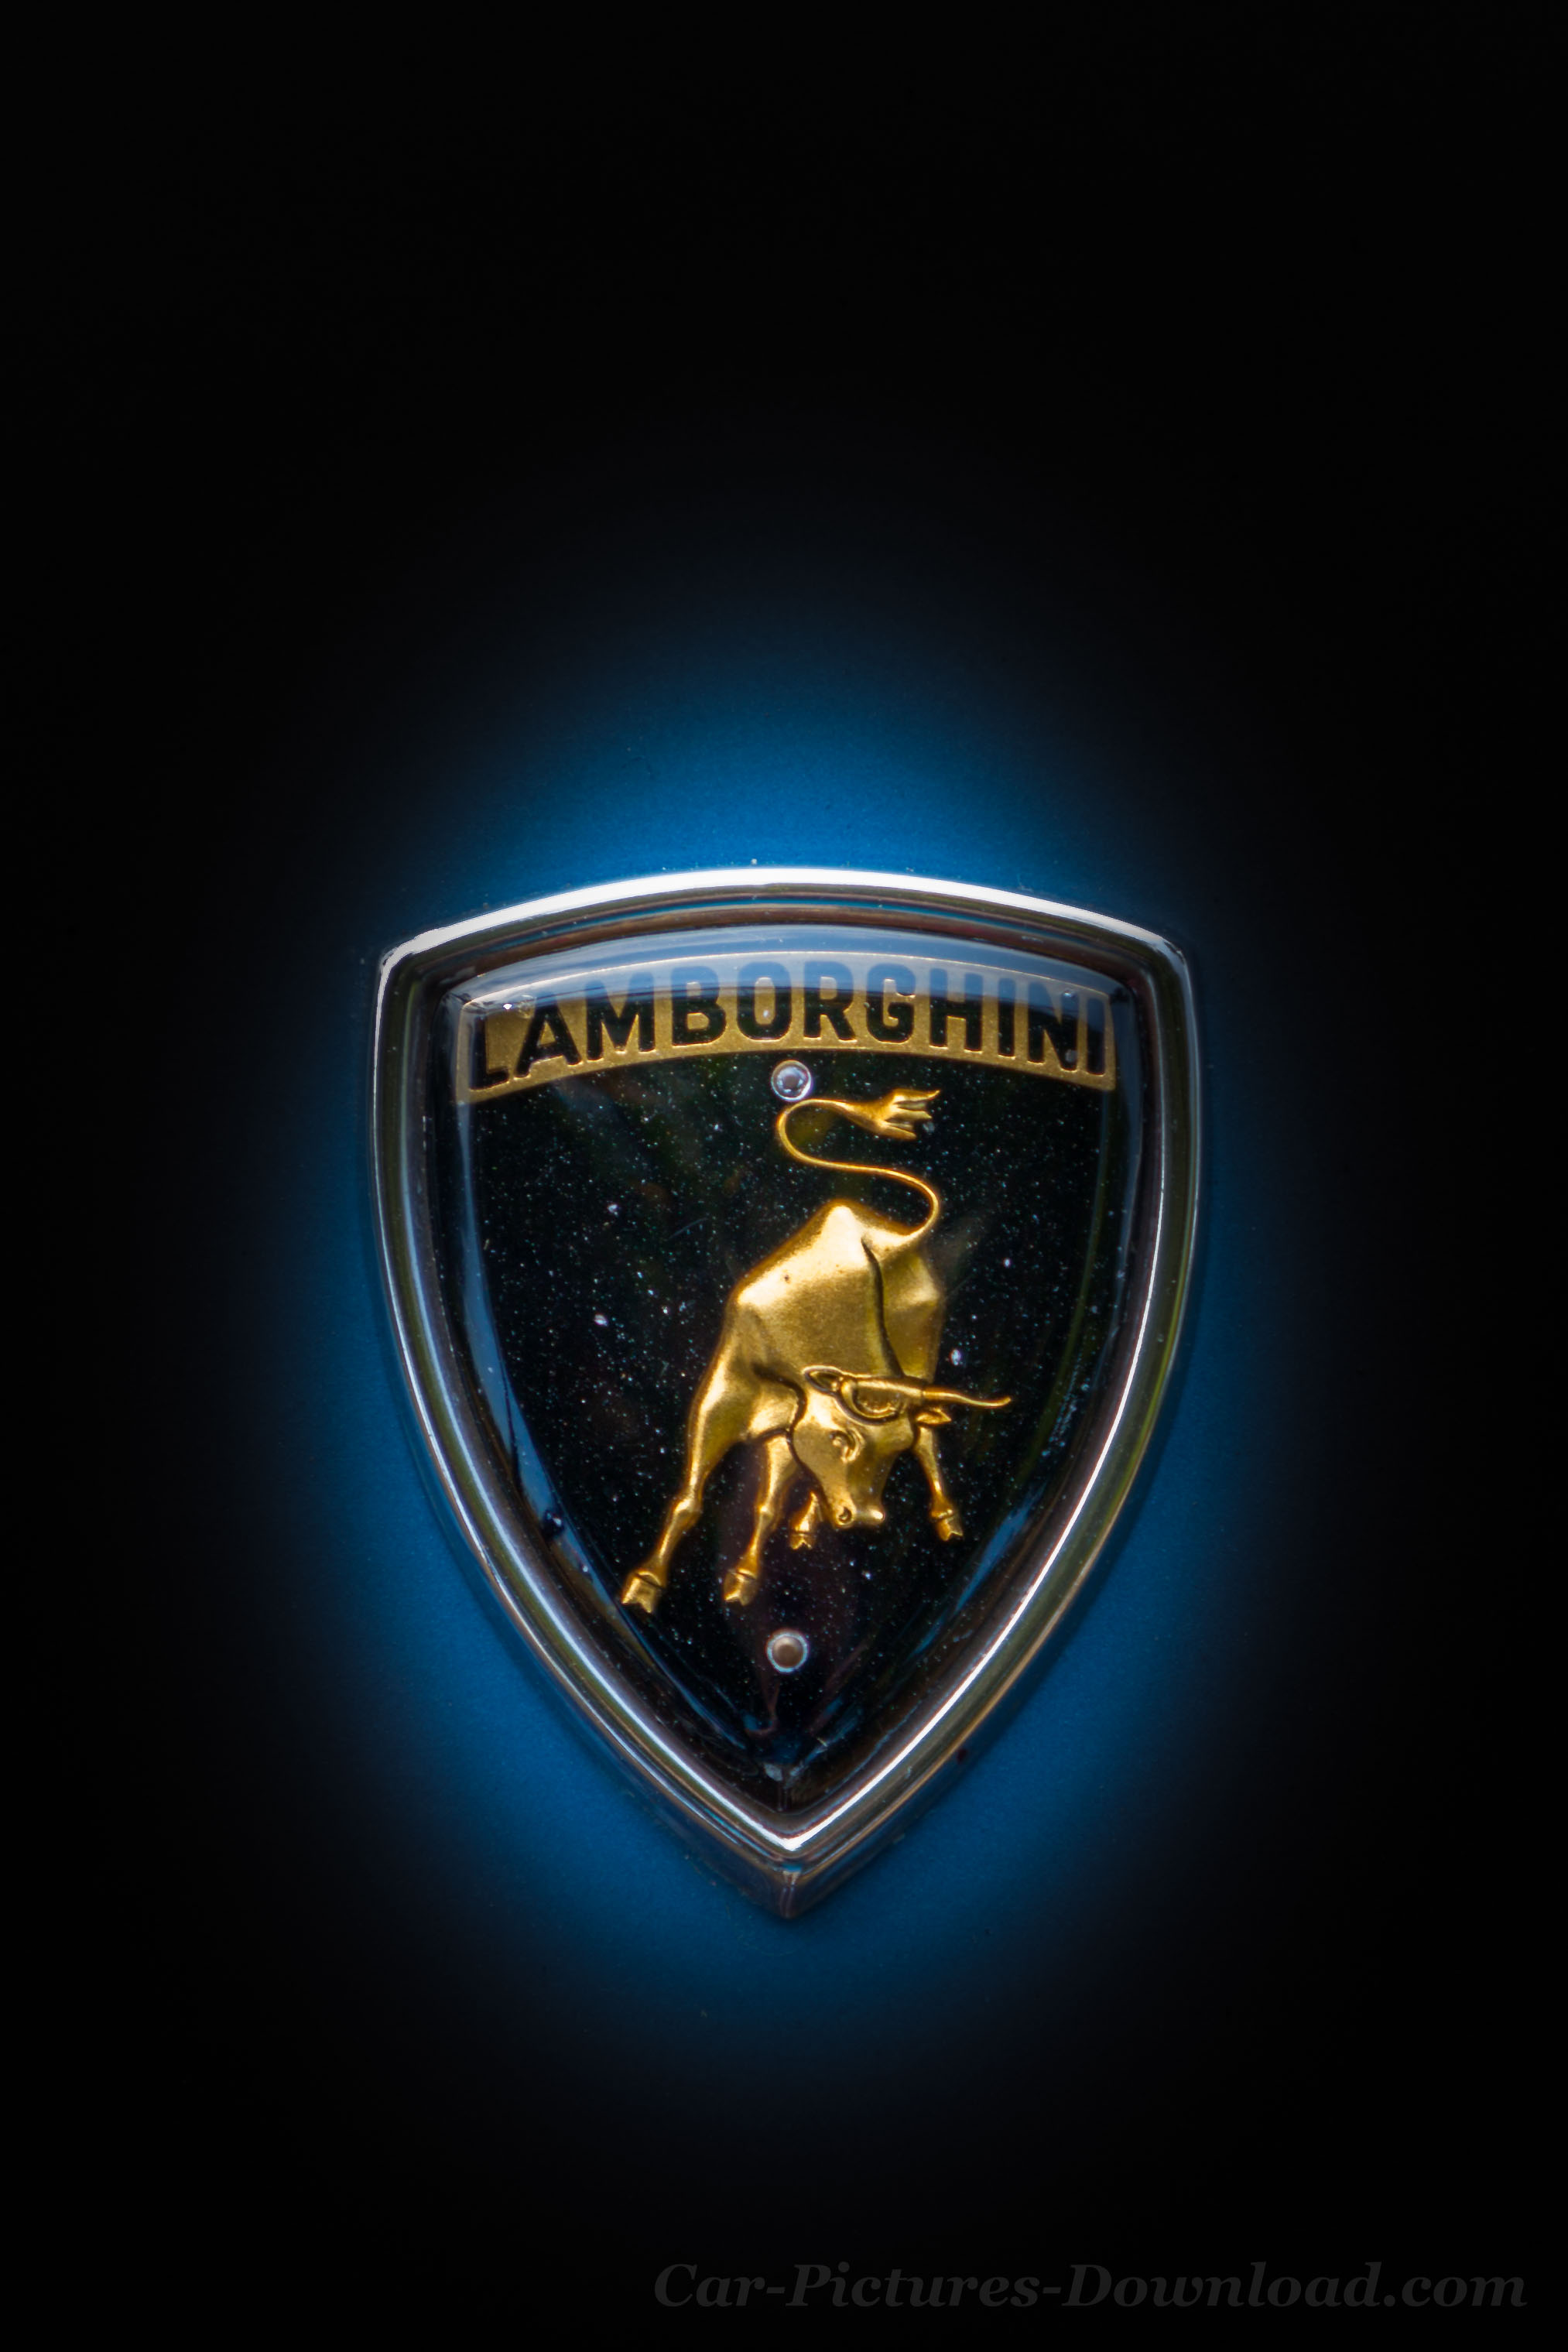 Lamborghini Wallpaper Images   4K Ultra HD Screens   Download 2026x3039